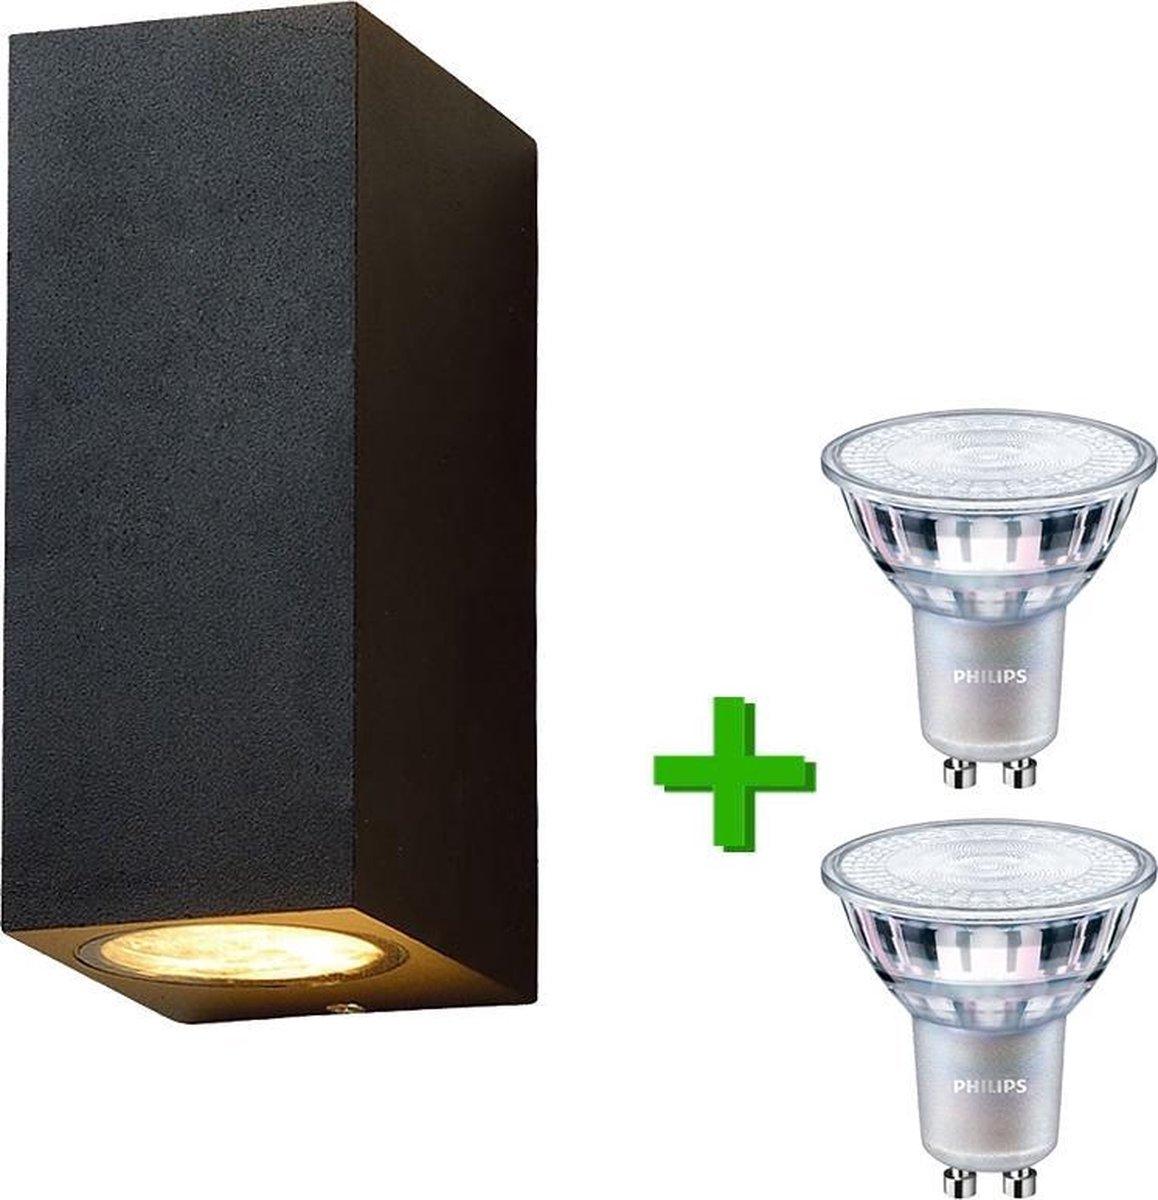 Lybardo buitenlamp / wandlamp Cannes Zwart + 2x Philips GU10 LED lamp 3.5W - 2700K Warm Wit